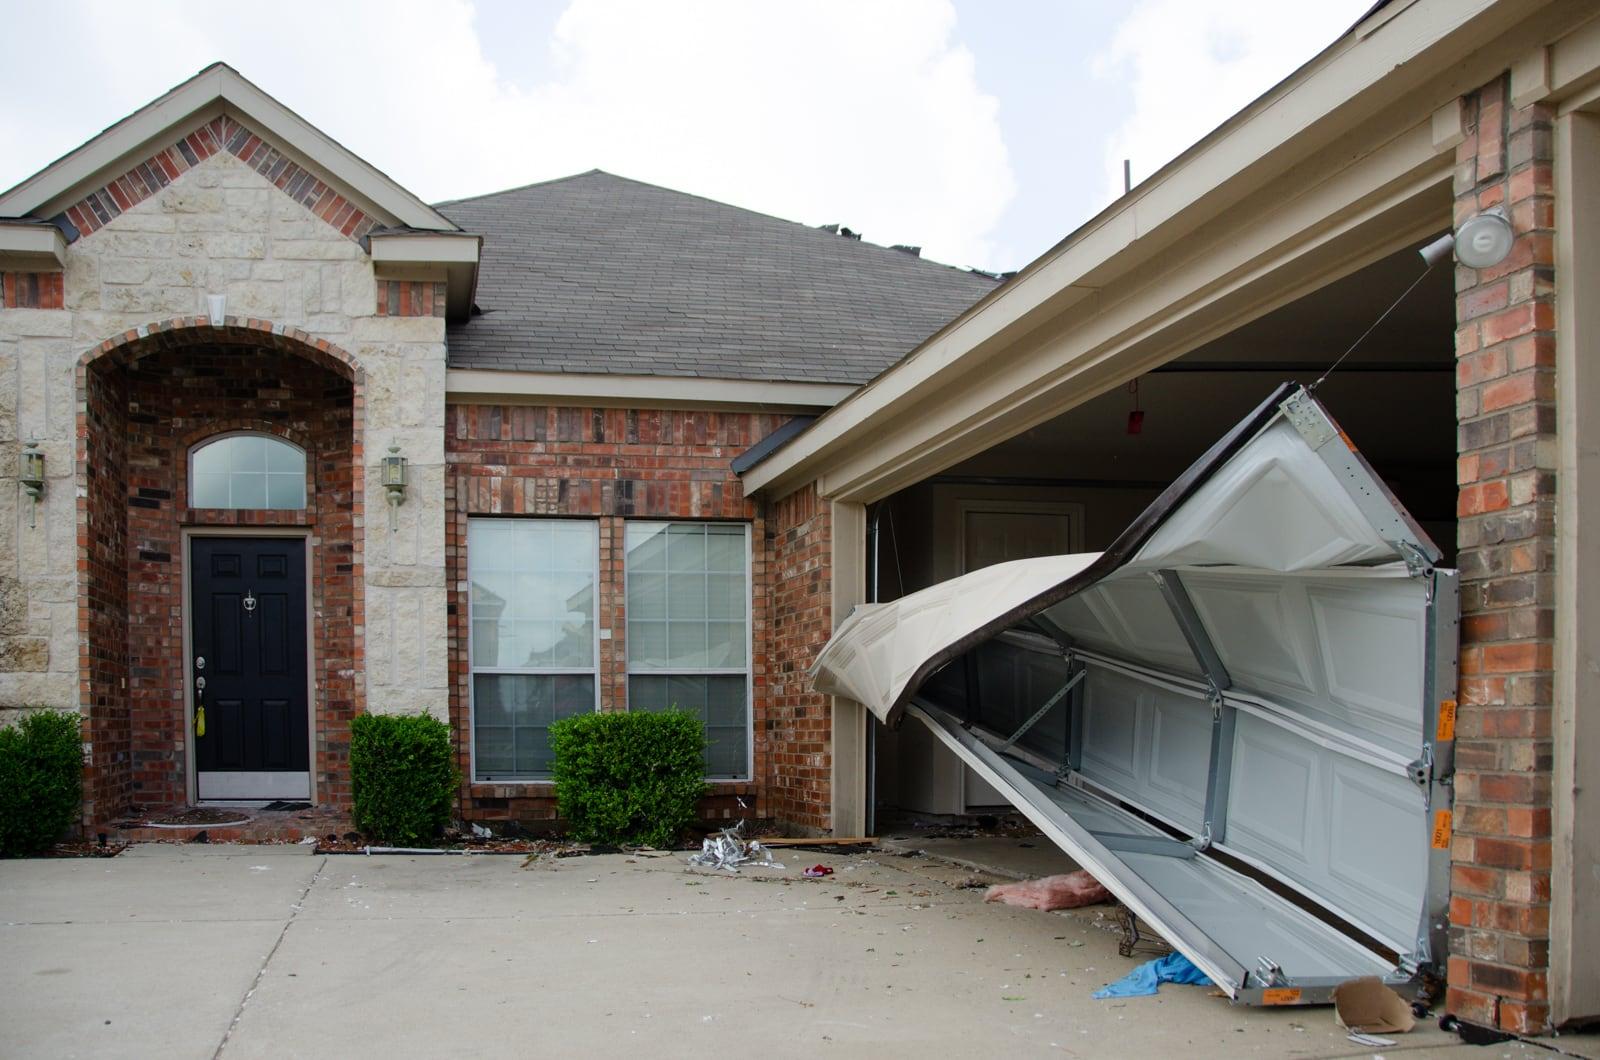 A garage door destroyed by the tornado